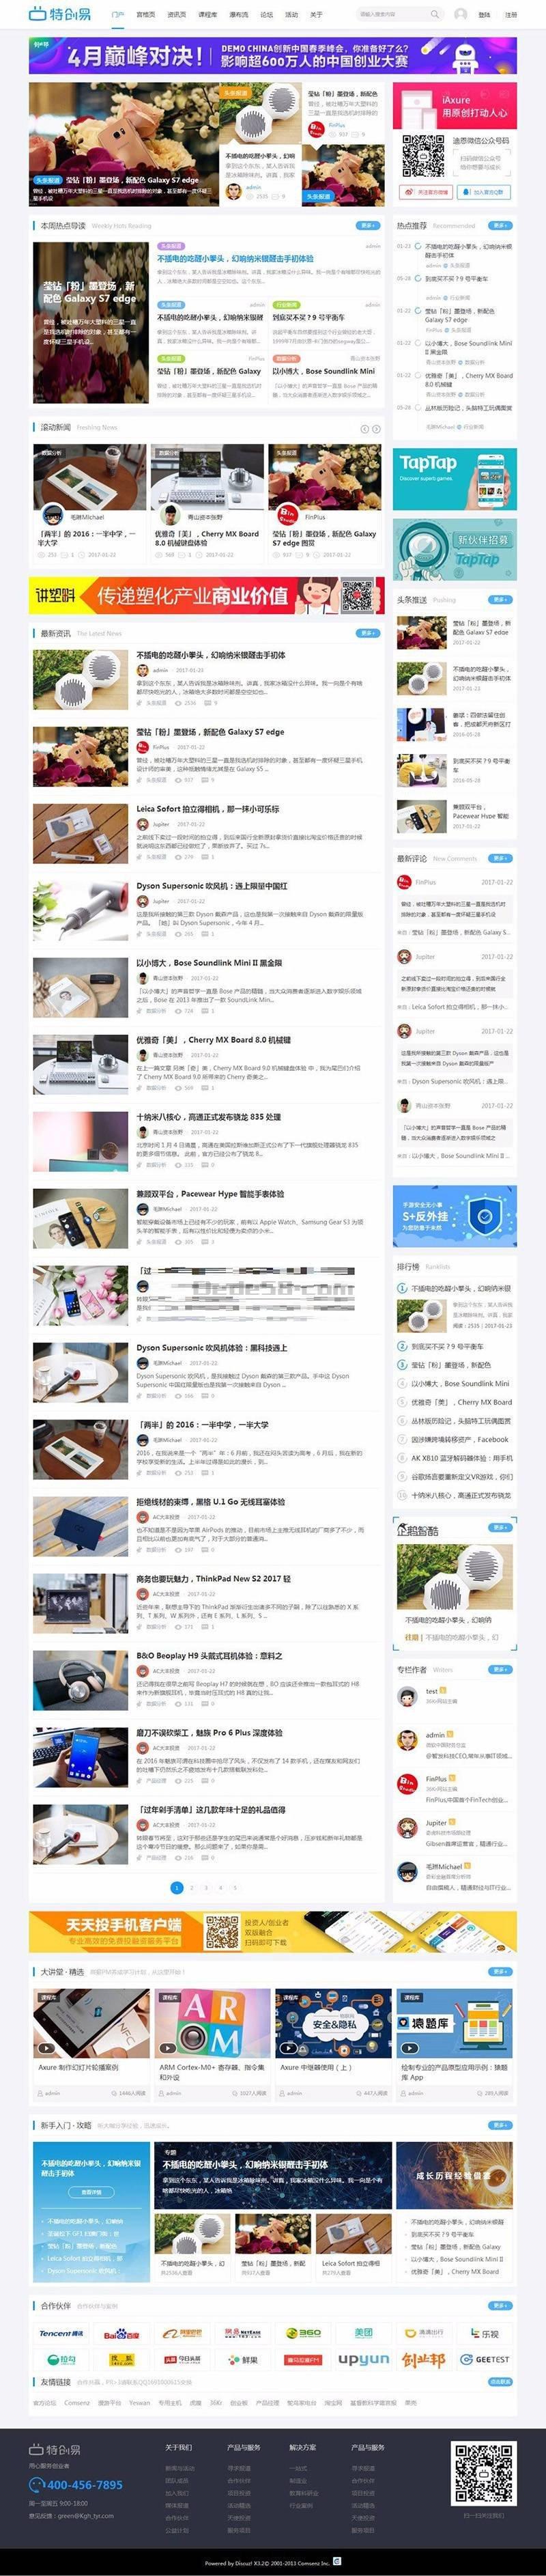 【discuz模板下载】迪恩资讯媒体博客 课程干货商业模板 GBK+UTF(百度网盘资源)